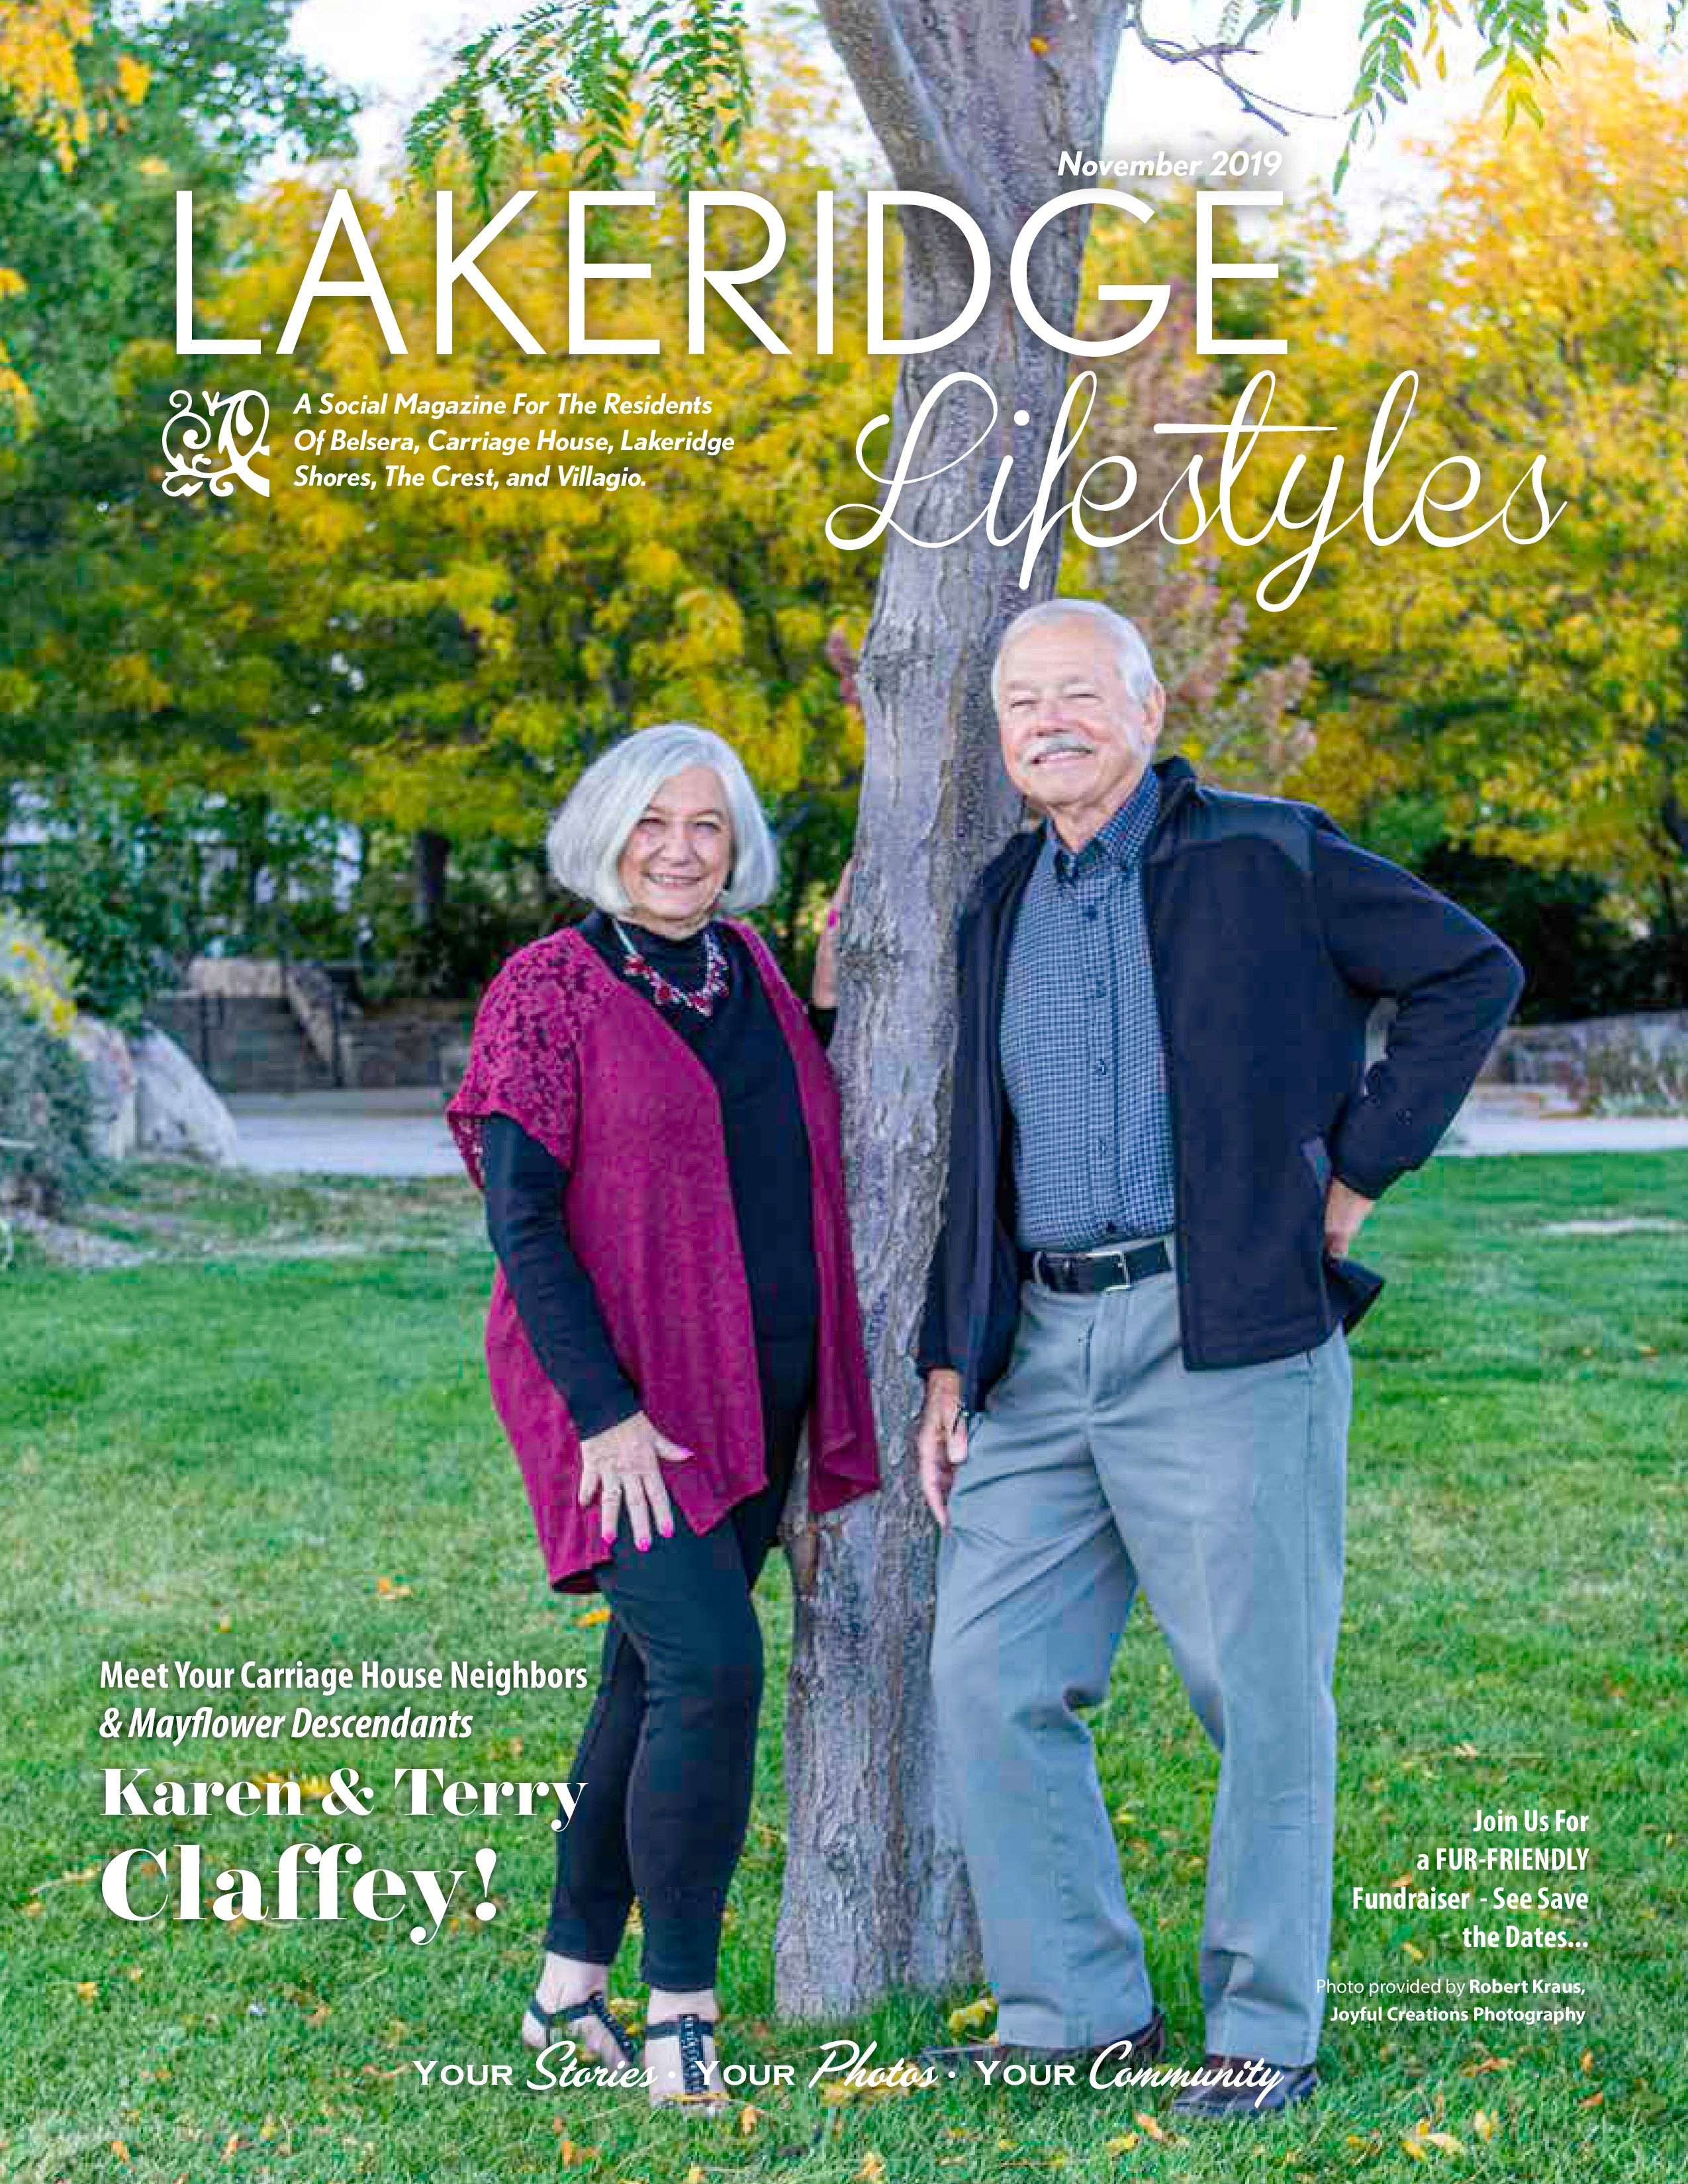 Nov 2019 lakeridge lifestyles page 1